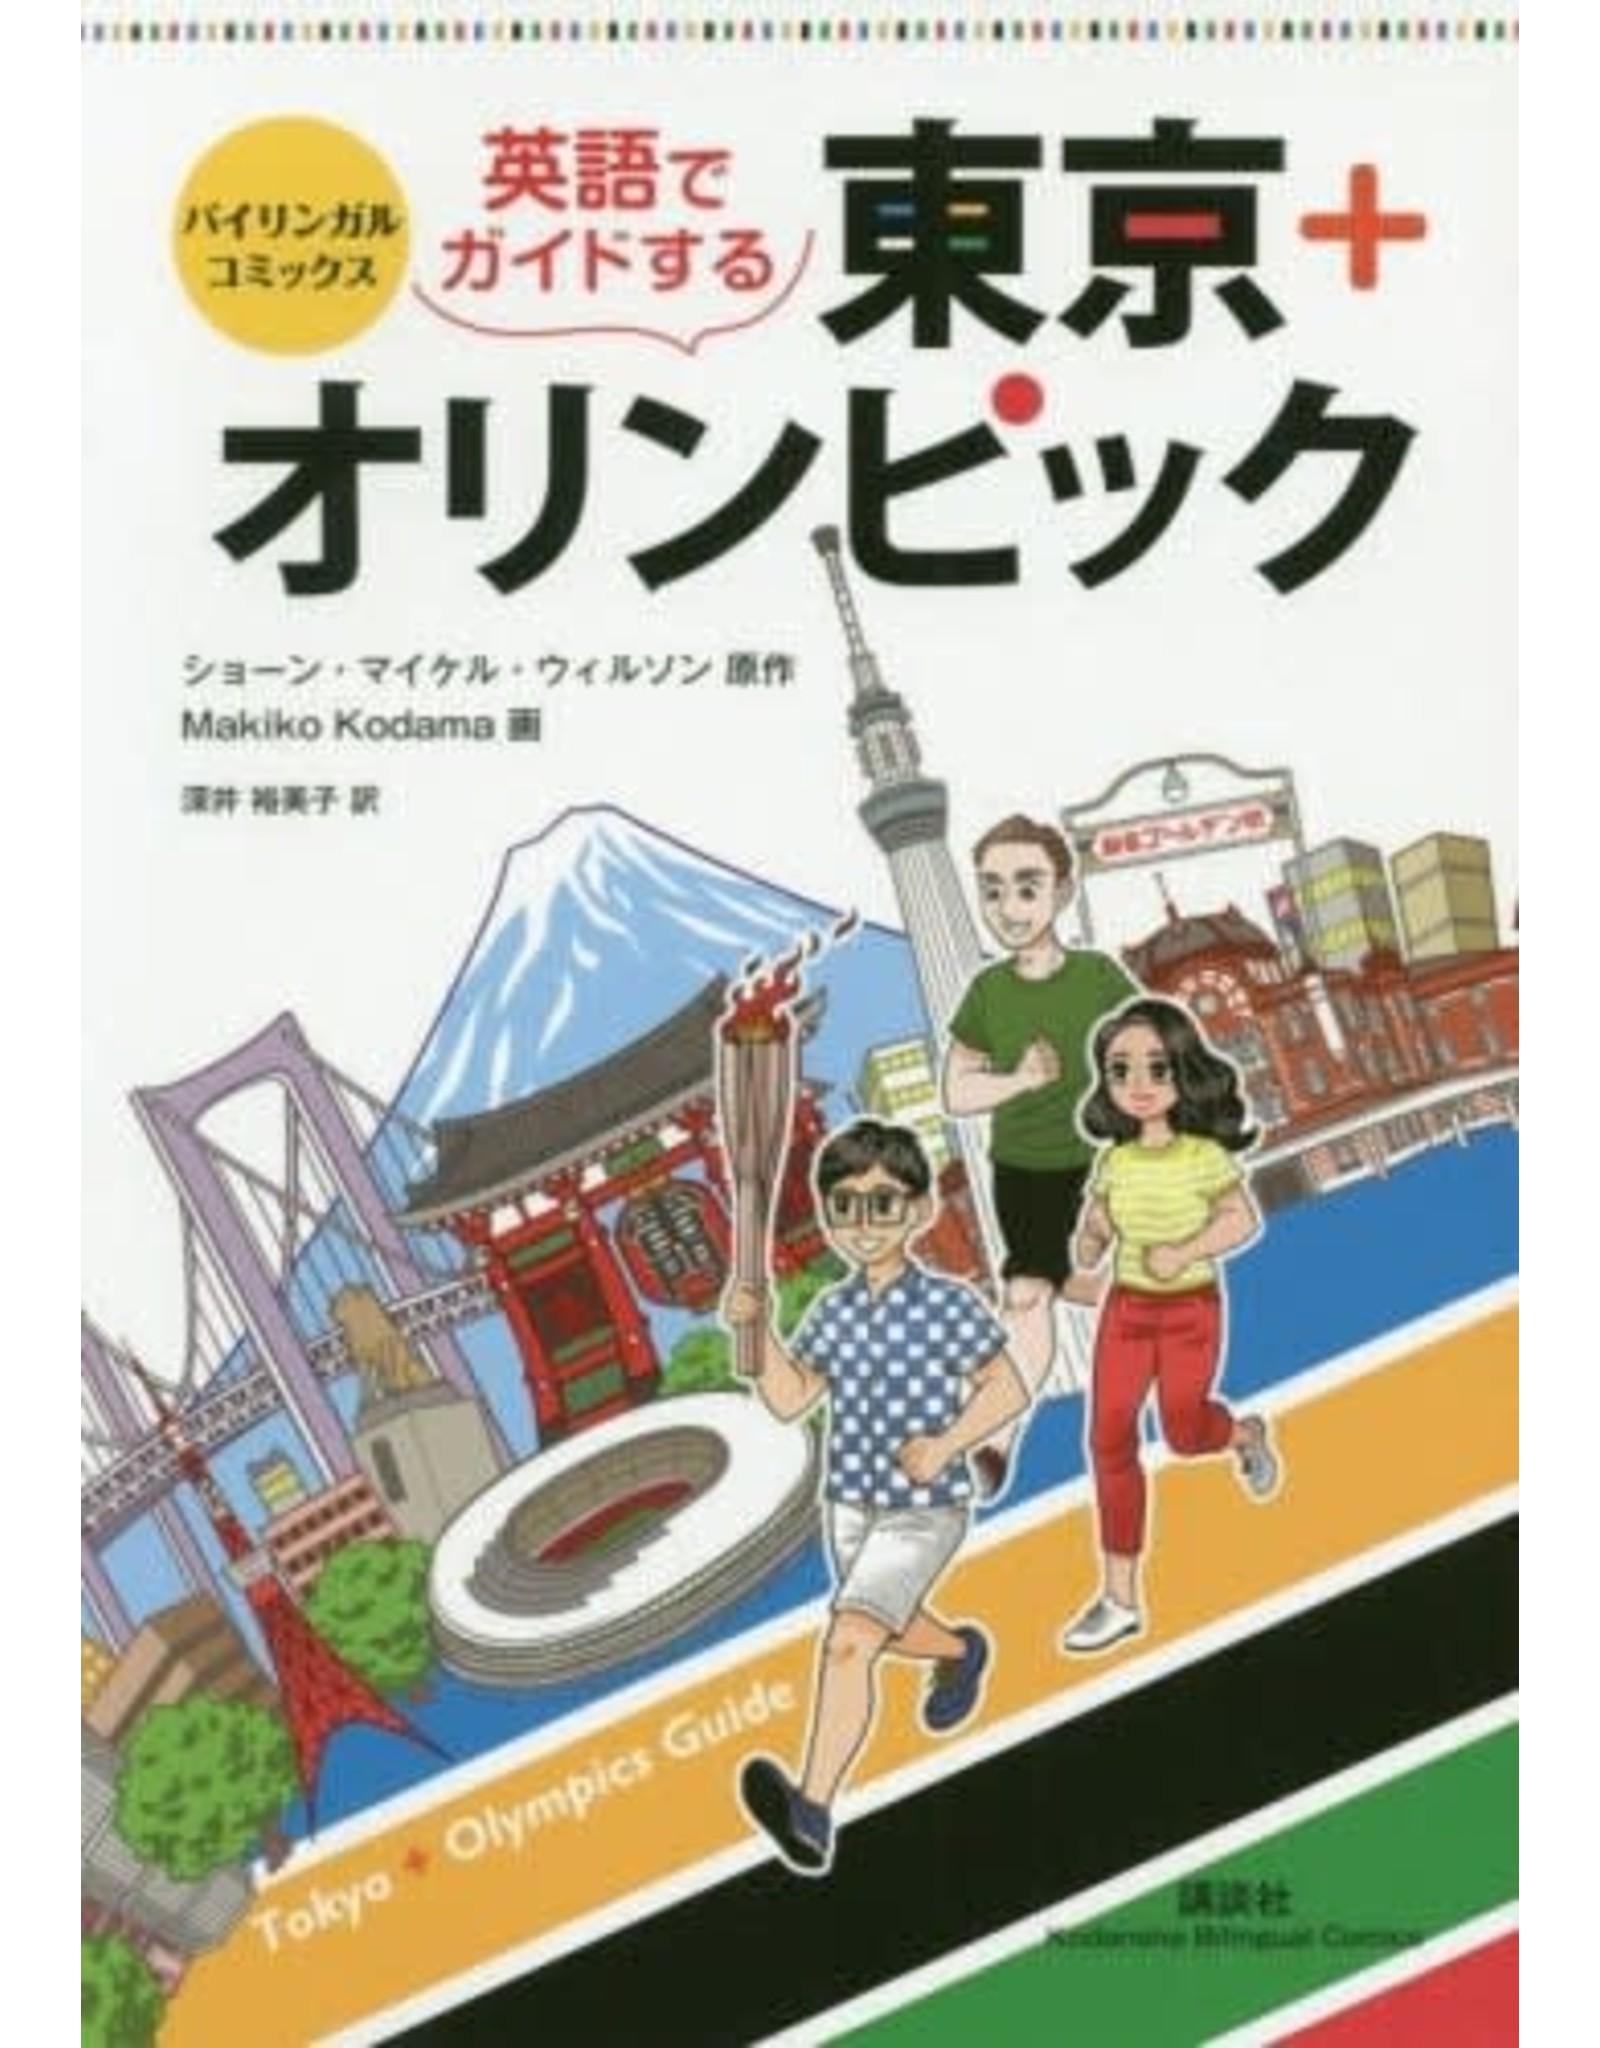 [BILINGUAL] BILINGUALCOMICS THE ENGLISH GUIDE OF TOKYO+OLYMPIC